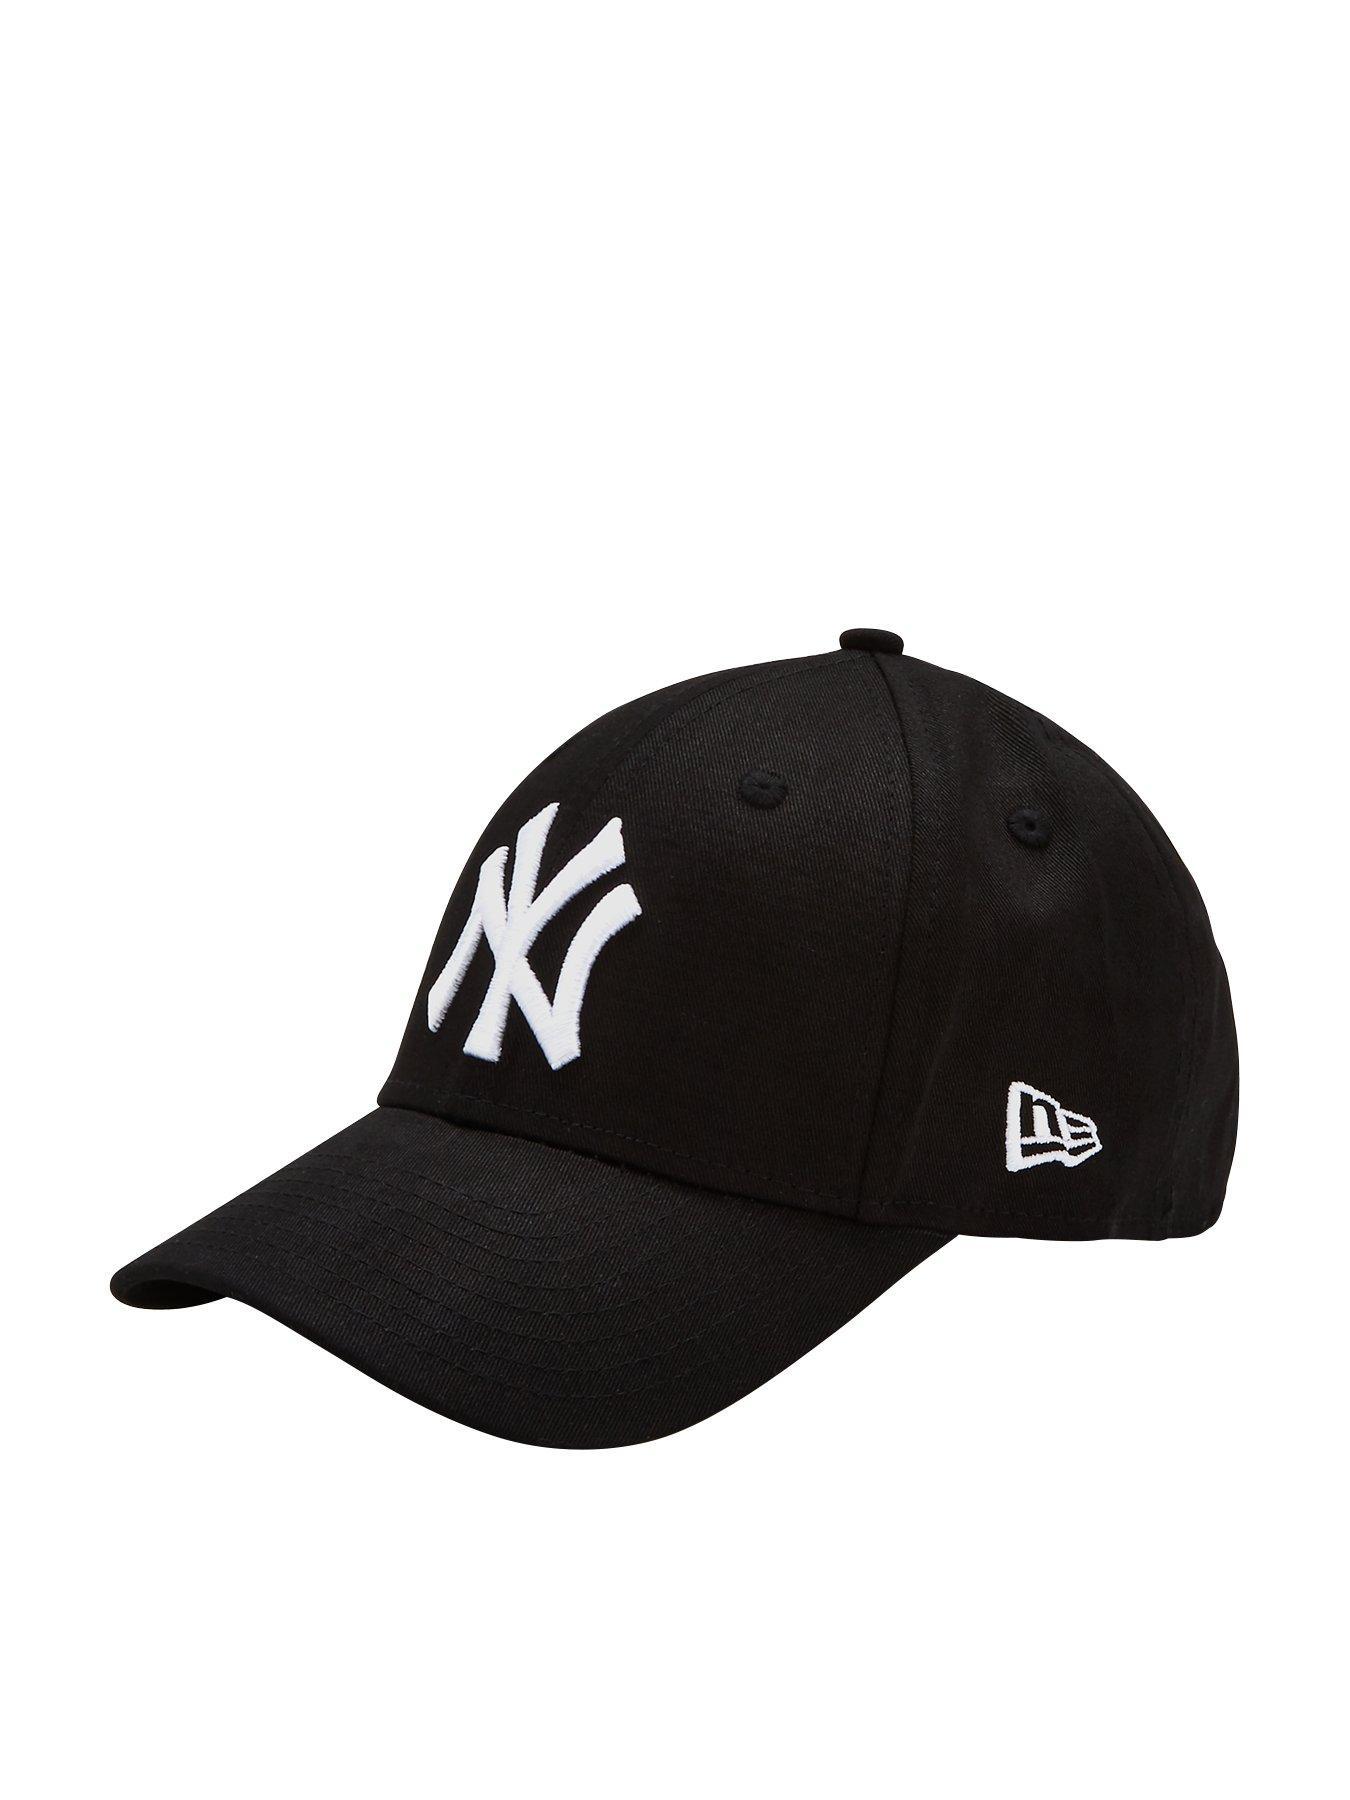 eb1a4036f8d4b authentic new york yankees mlb hats 73f66 3687f  wholesale new era youth  940 new york yankees cap f5a34 b7800